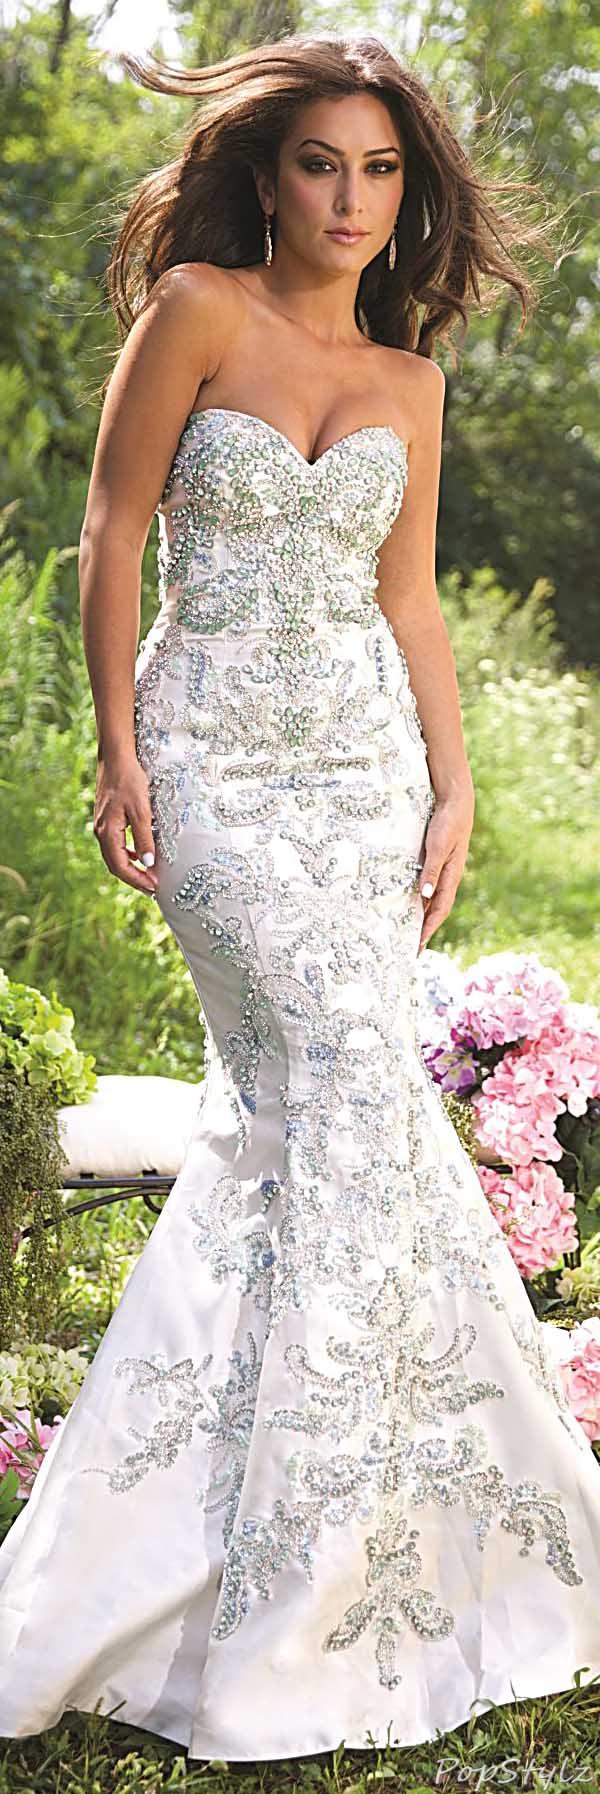 Jovani 20944 Strapless 2015 Mermaid Evening Gown